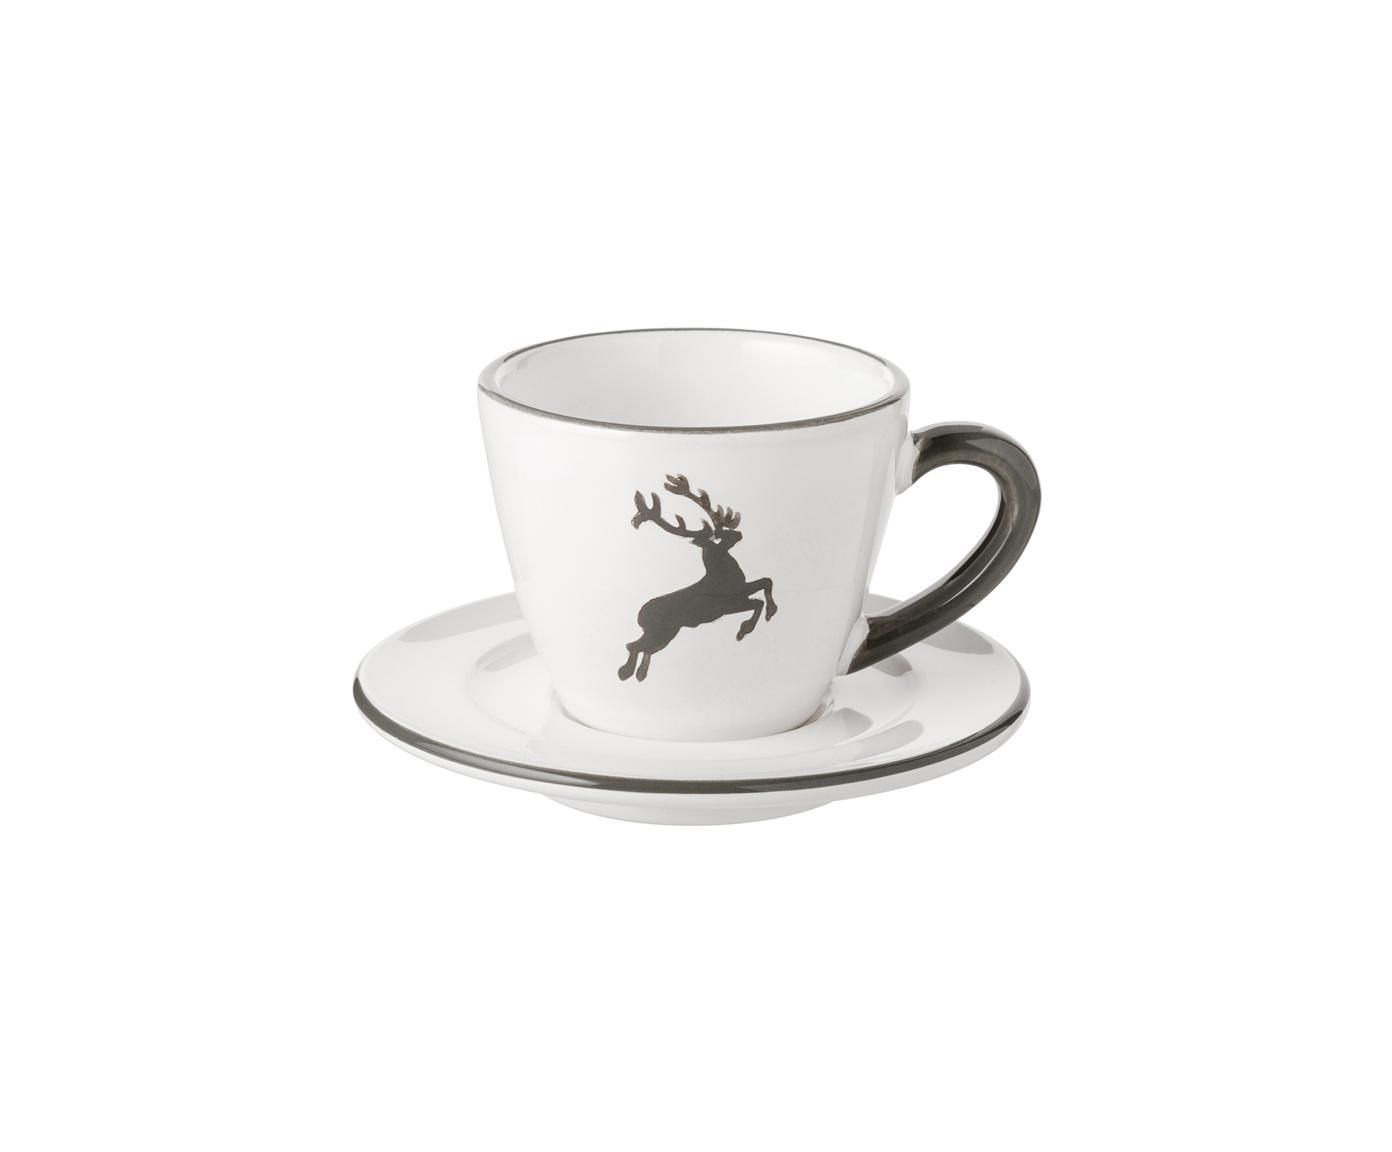 Set tazze da caffè Gourmet Grauer Hirsch, Ceramica, Grigio, bianco, 60 ml